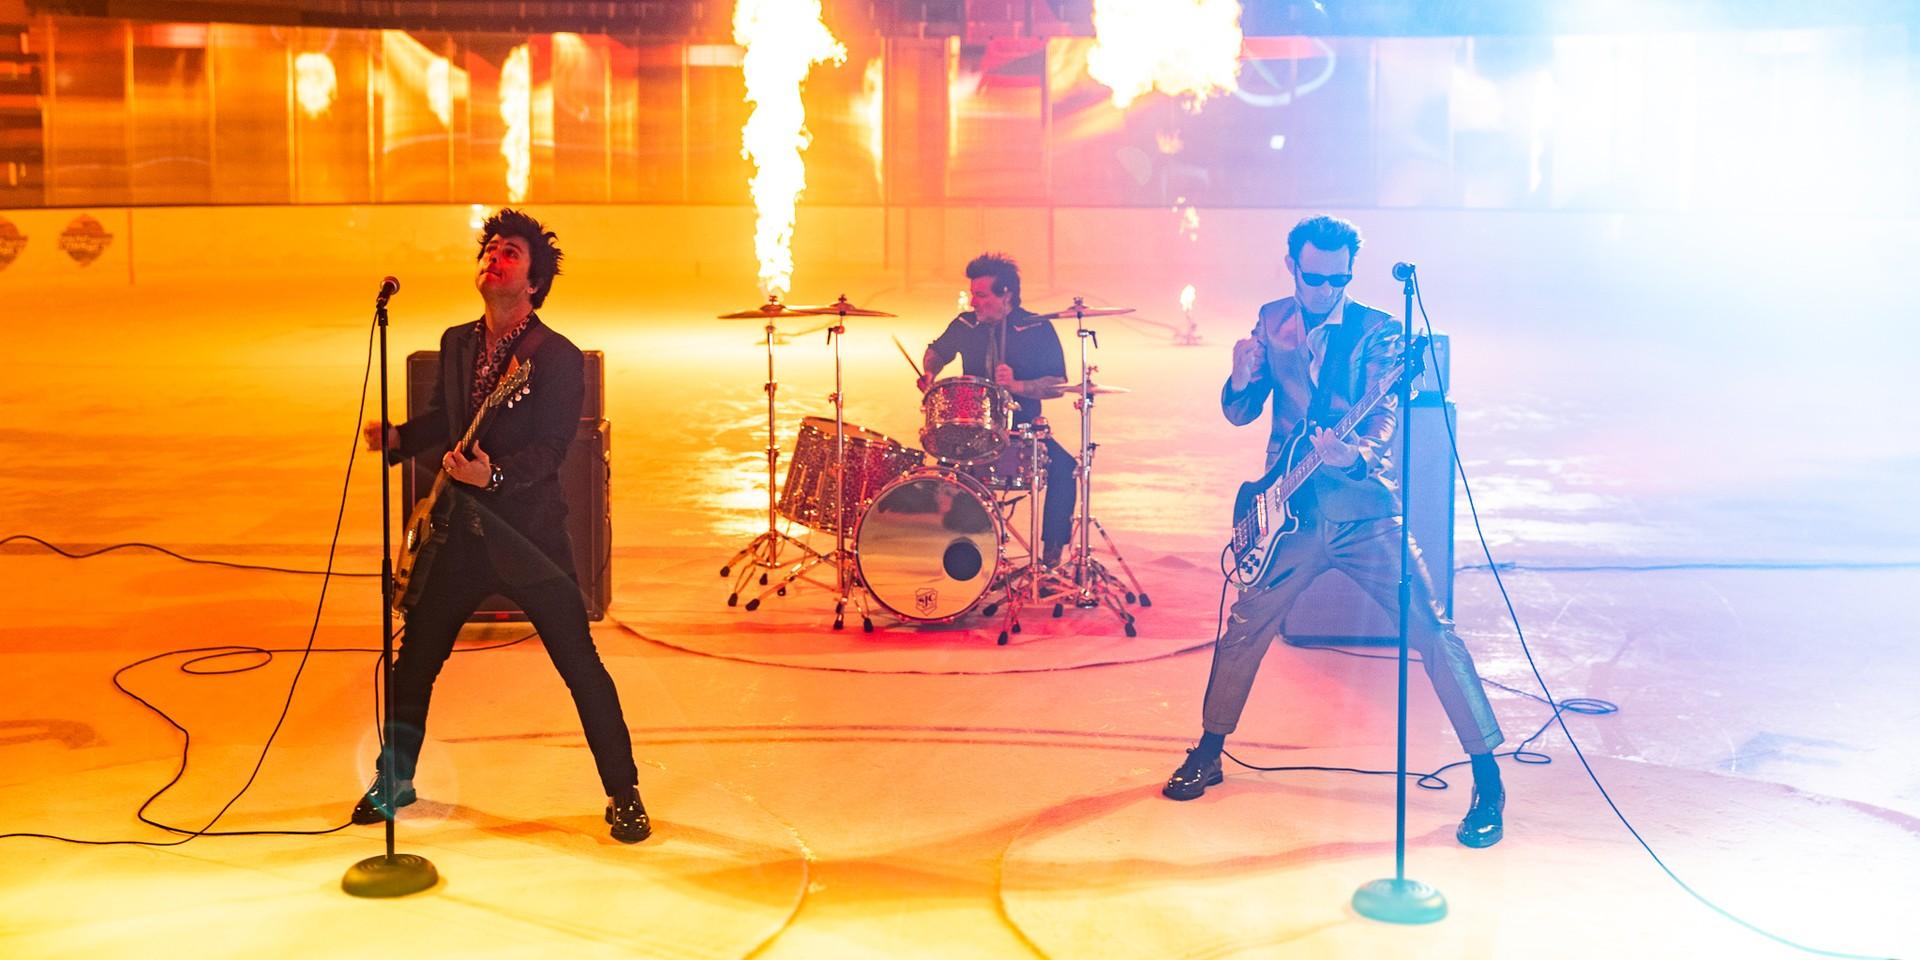 Green Day cancel Asia tour - Manila, Singapore, Bangkok, Tokyo, Osaka, Hong Kong, Seoul, and Taipei